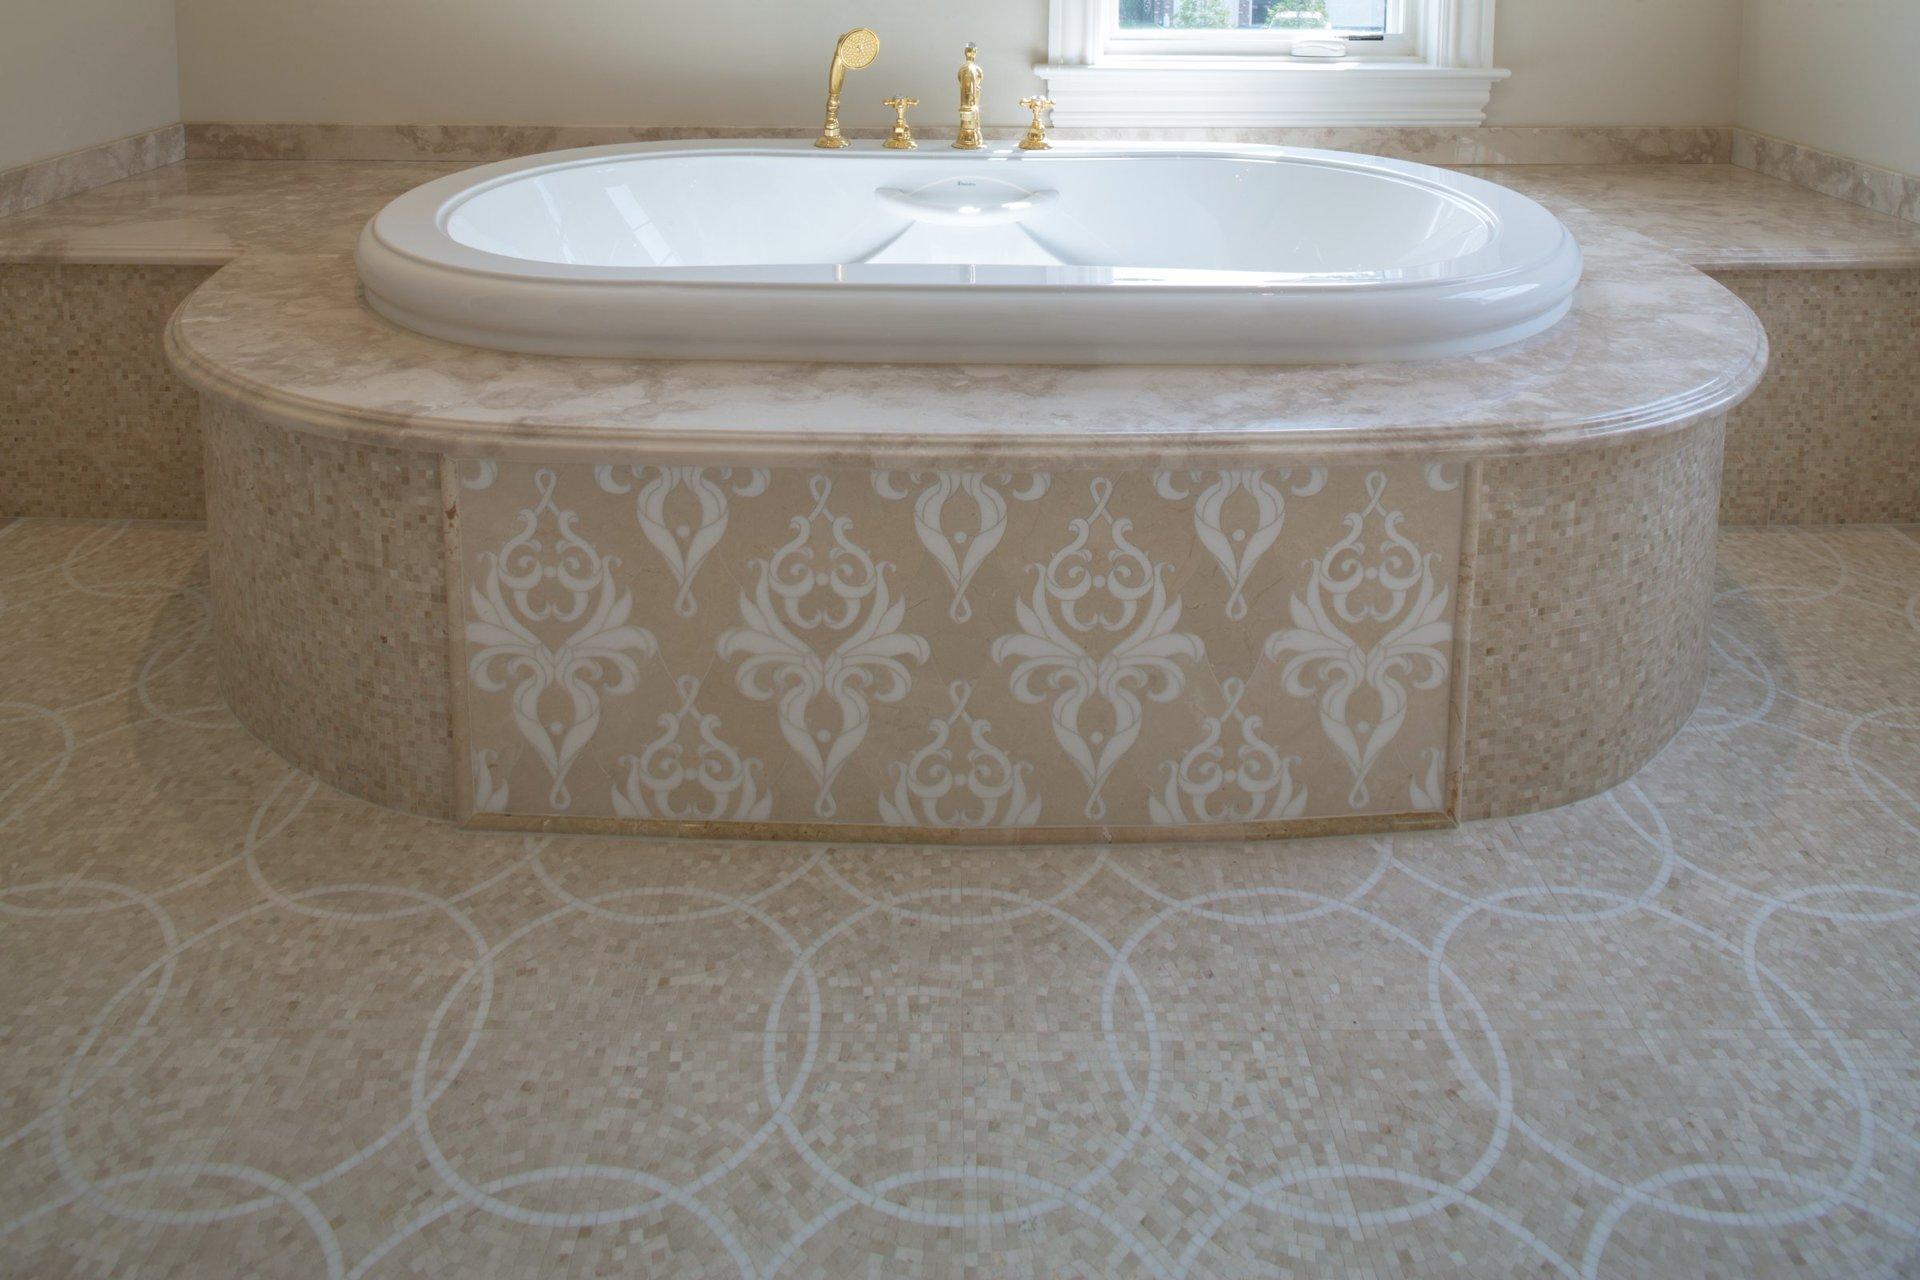 Bathroom Vanities Jericho Turnpike porcelain tiles & bathroom vanities | melville, woodbury & syosset, ny